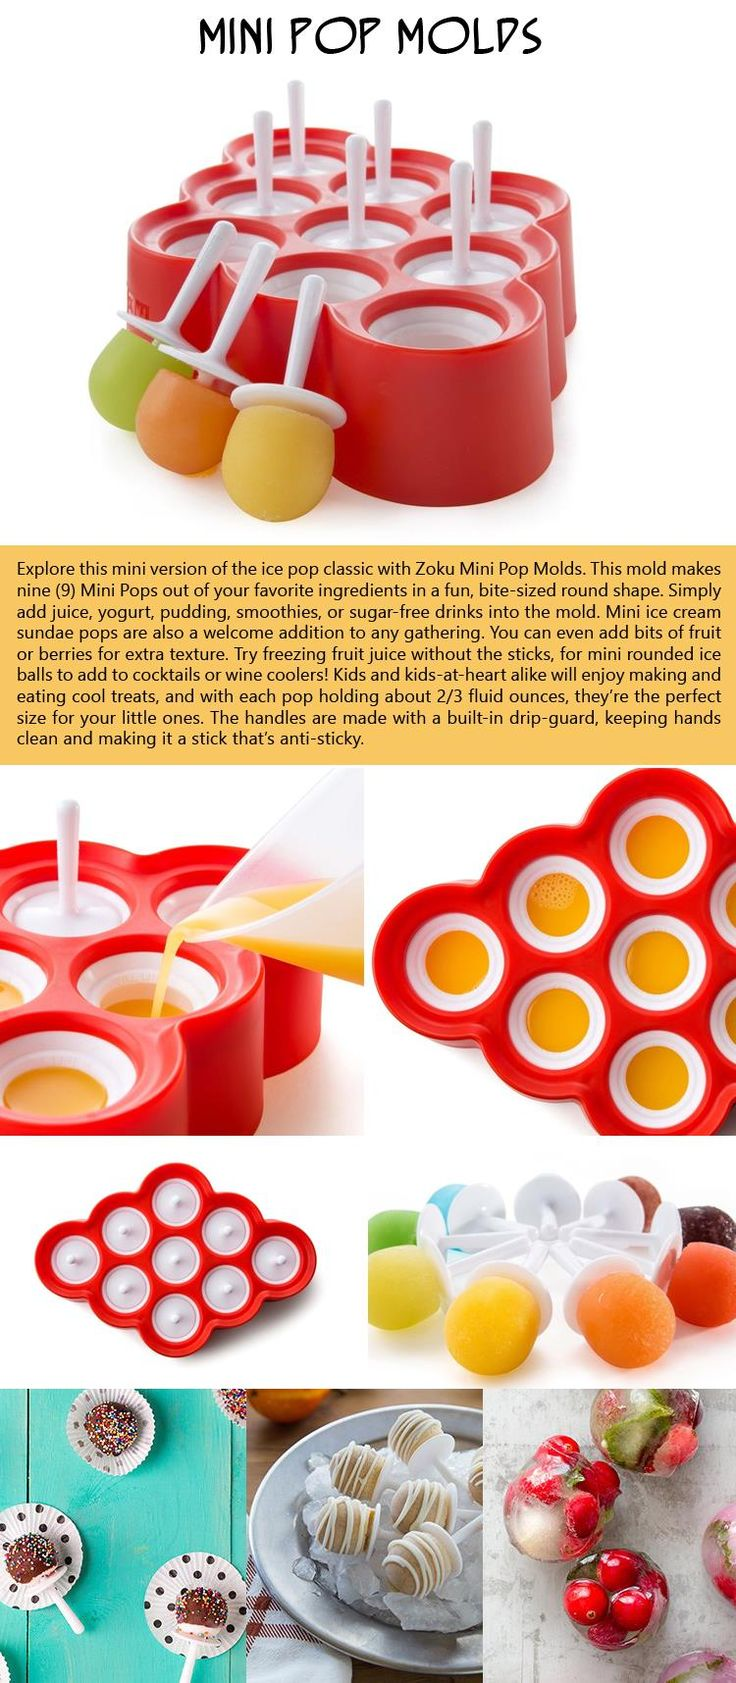 Mini Pop Molds